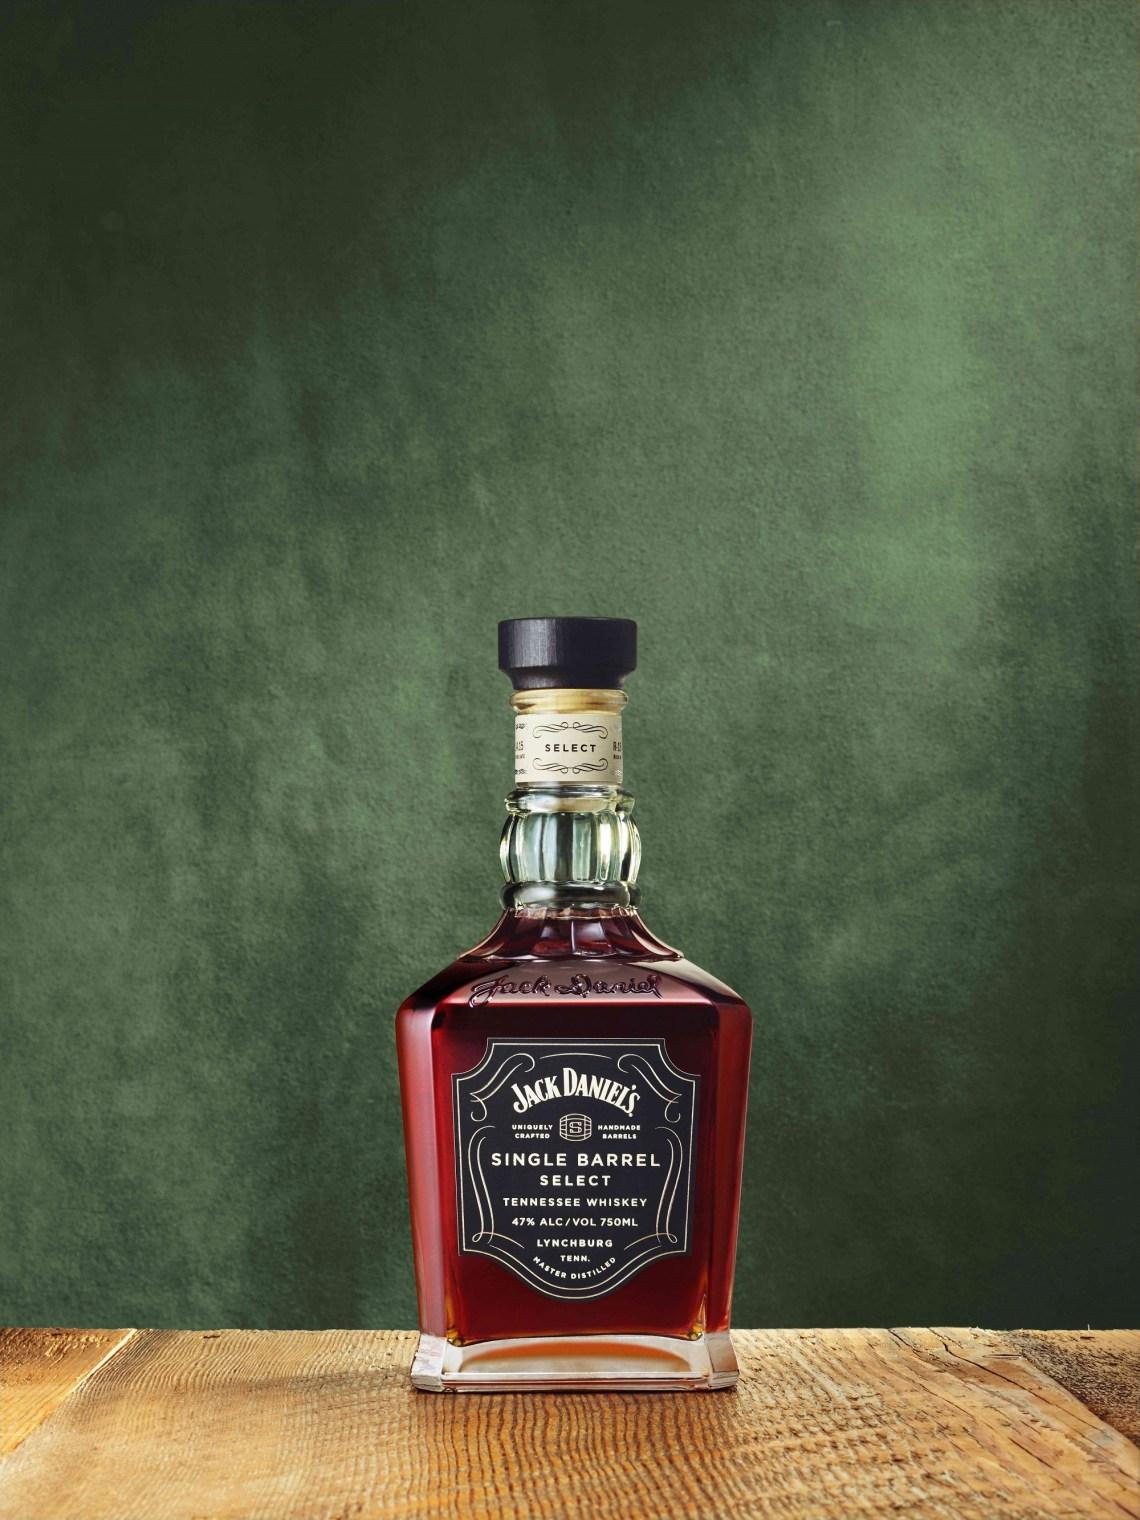 Jack Daniel's Single Barrel Select Tennessee Whiskey (2015)